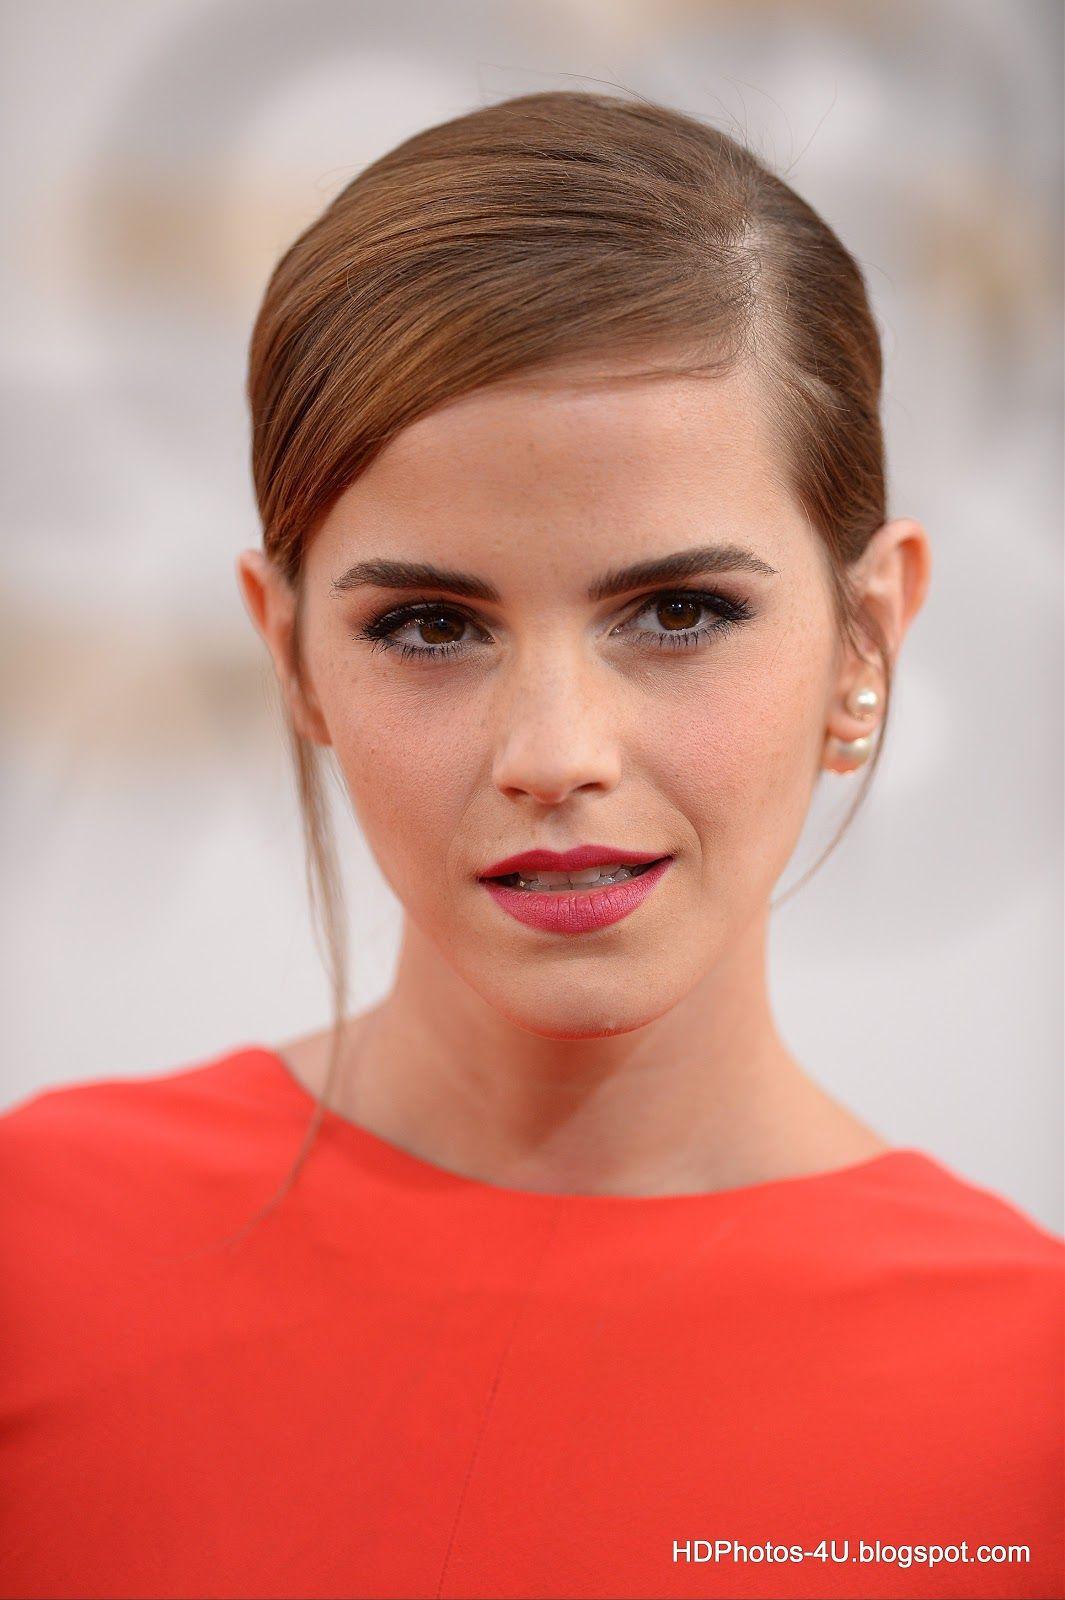 Harry Potter actress Emma Watson Full HD Photos